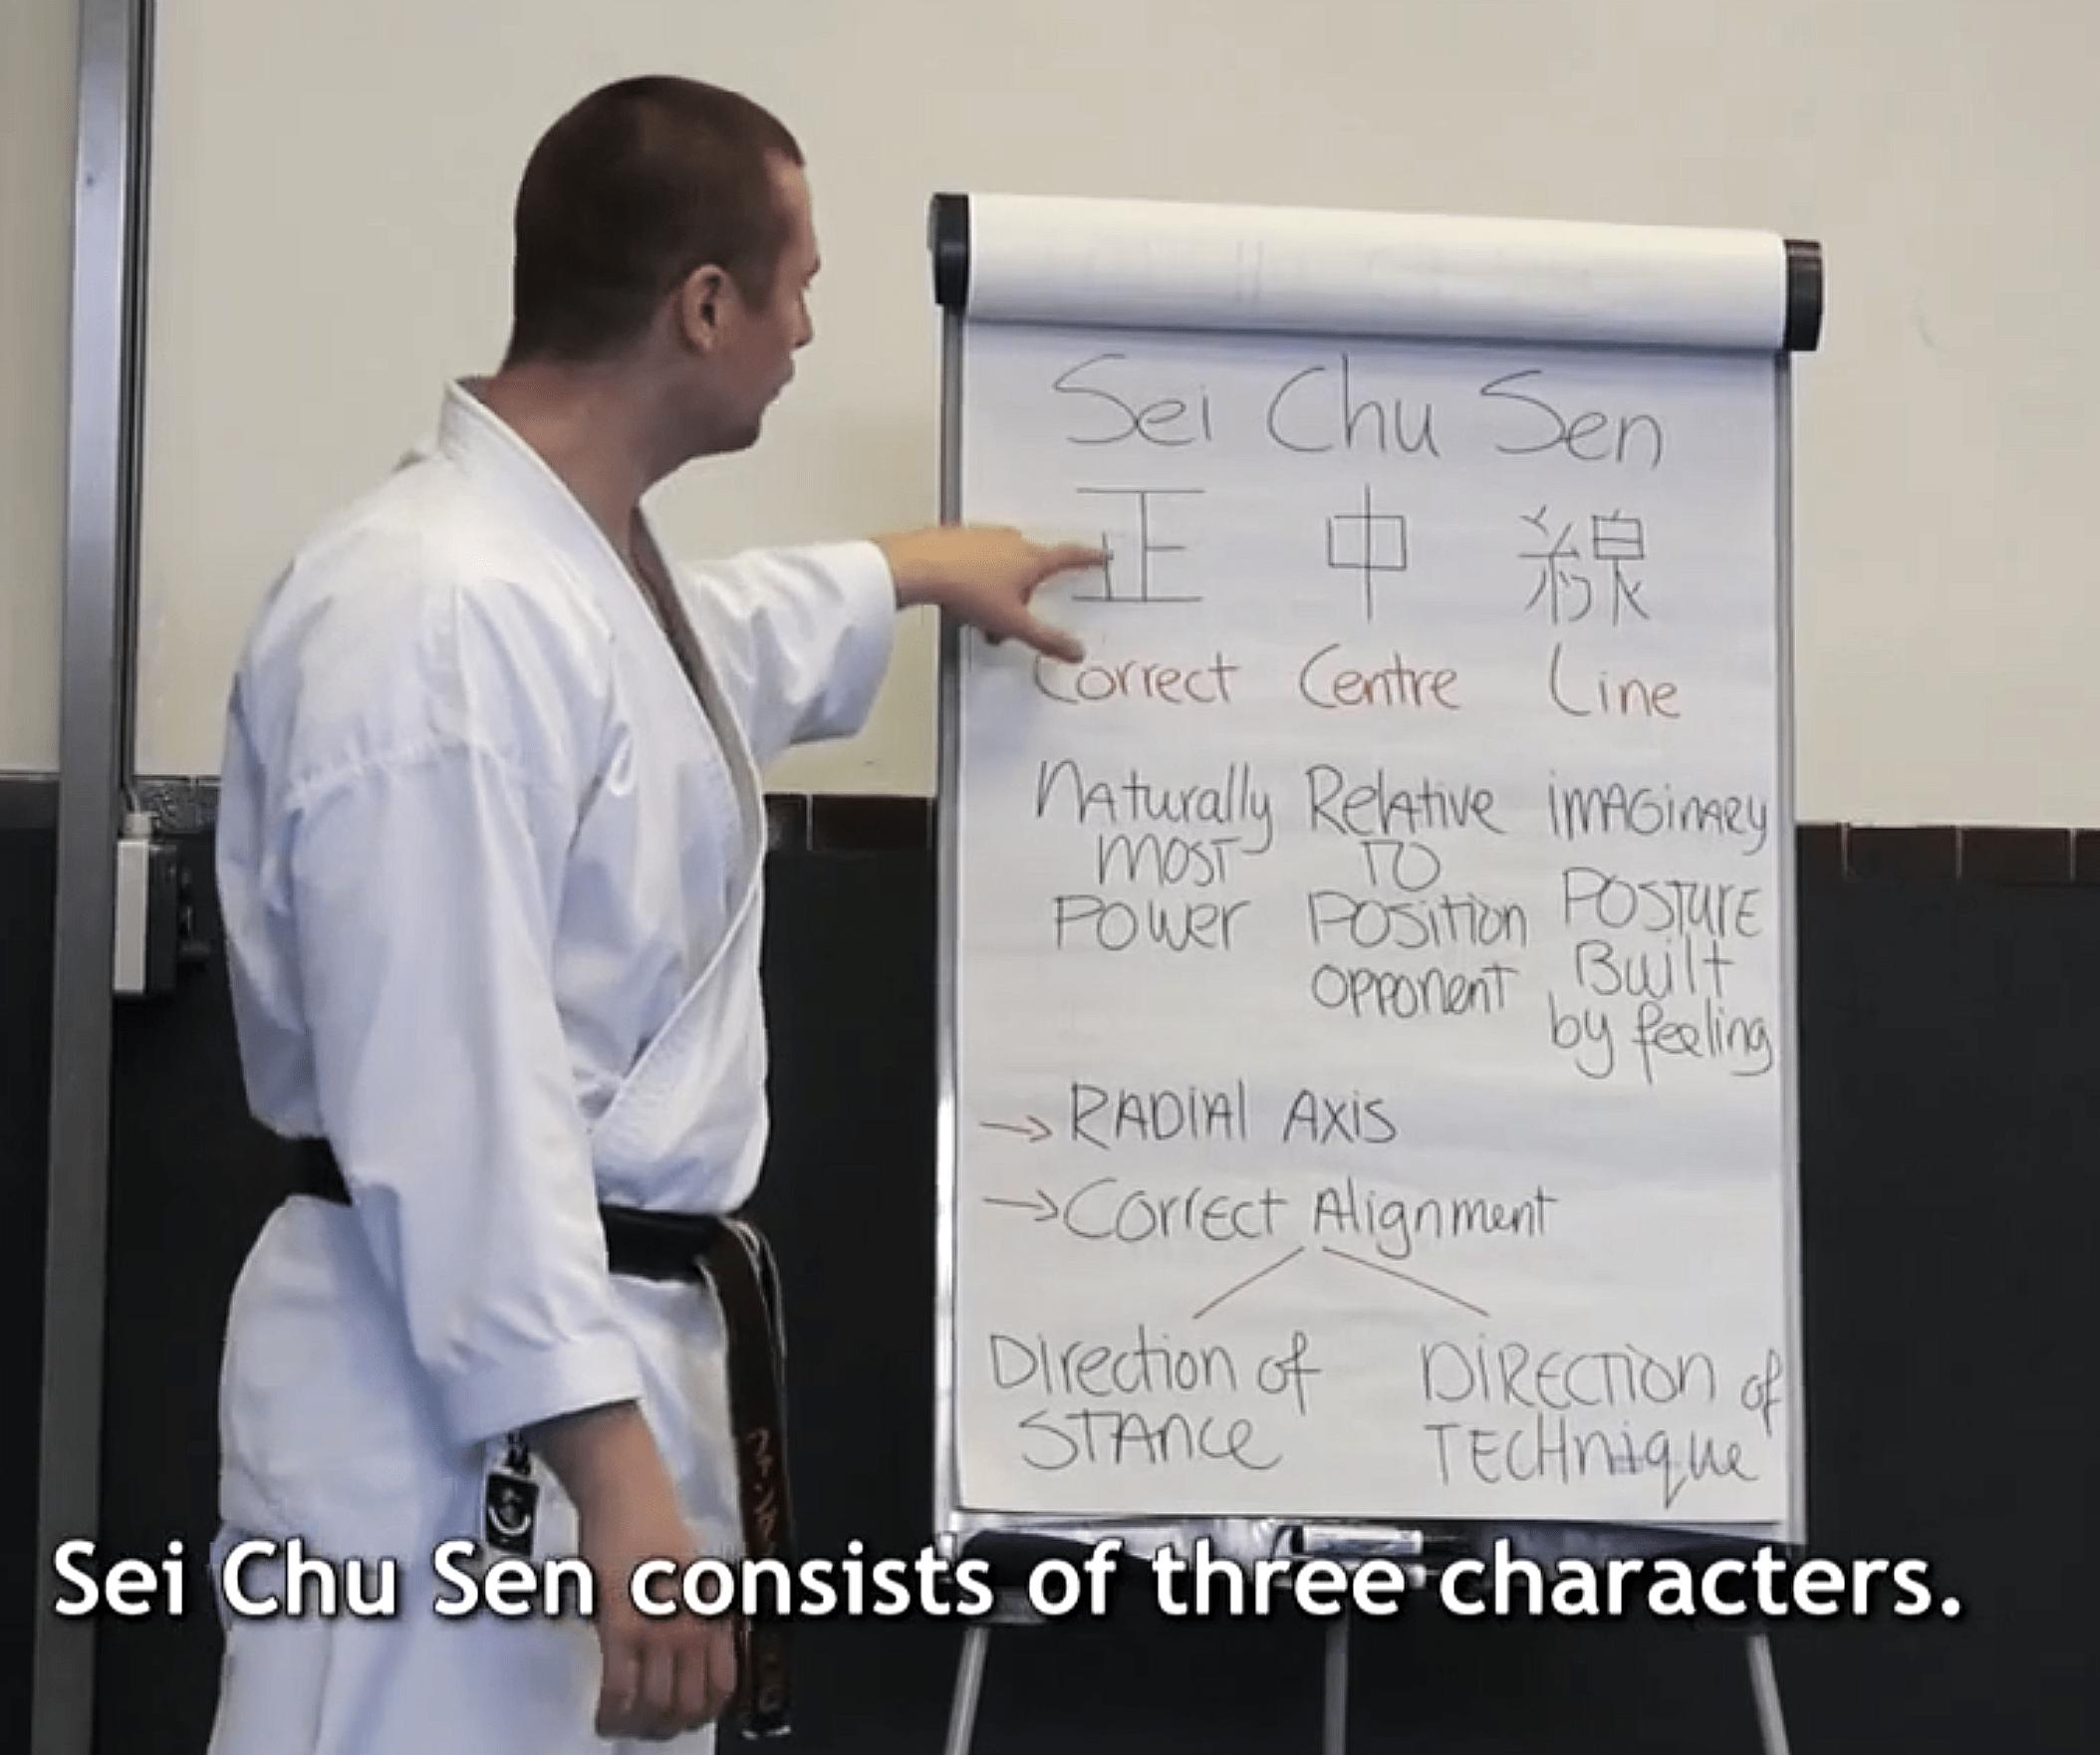 Karate Seminar on Seichusen by AJ van Dijk